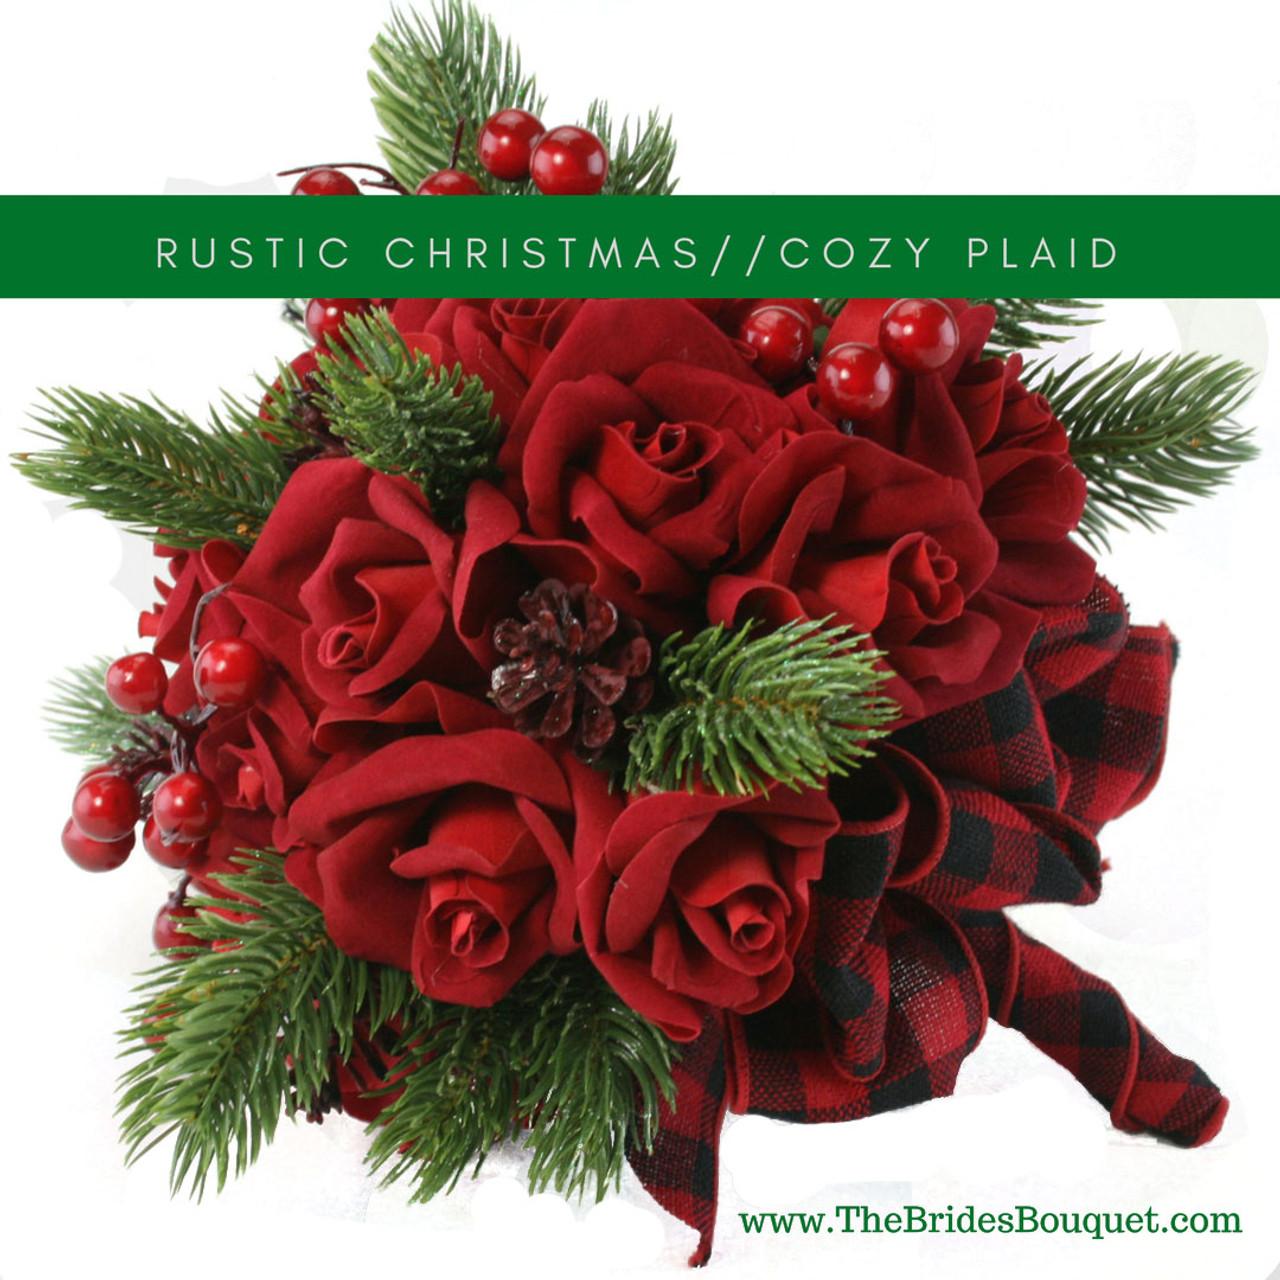 Christmas Flower Arrangements Artificial.Christmas Red Velvet Rose Bouquet Wedding Silk Wedding Flowers Cheap Bridal Bouquets Bridesmaid Bouquets Artificial Wedding Bouquets Buffalo